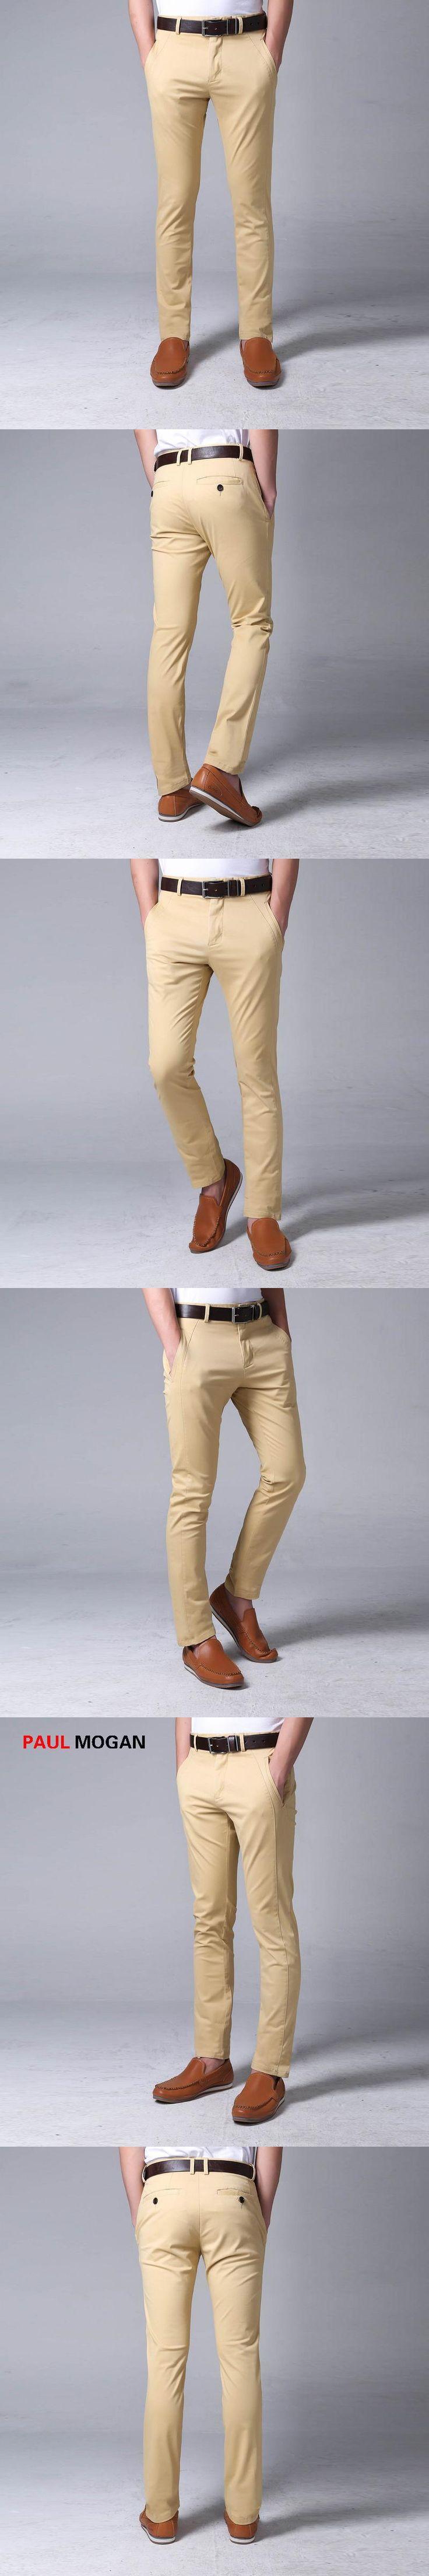 Paul Mogan pants men Apricot fashion high quality men cotton  pants trouser slim fit calca masculina pantalon hombre cargo pants